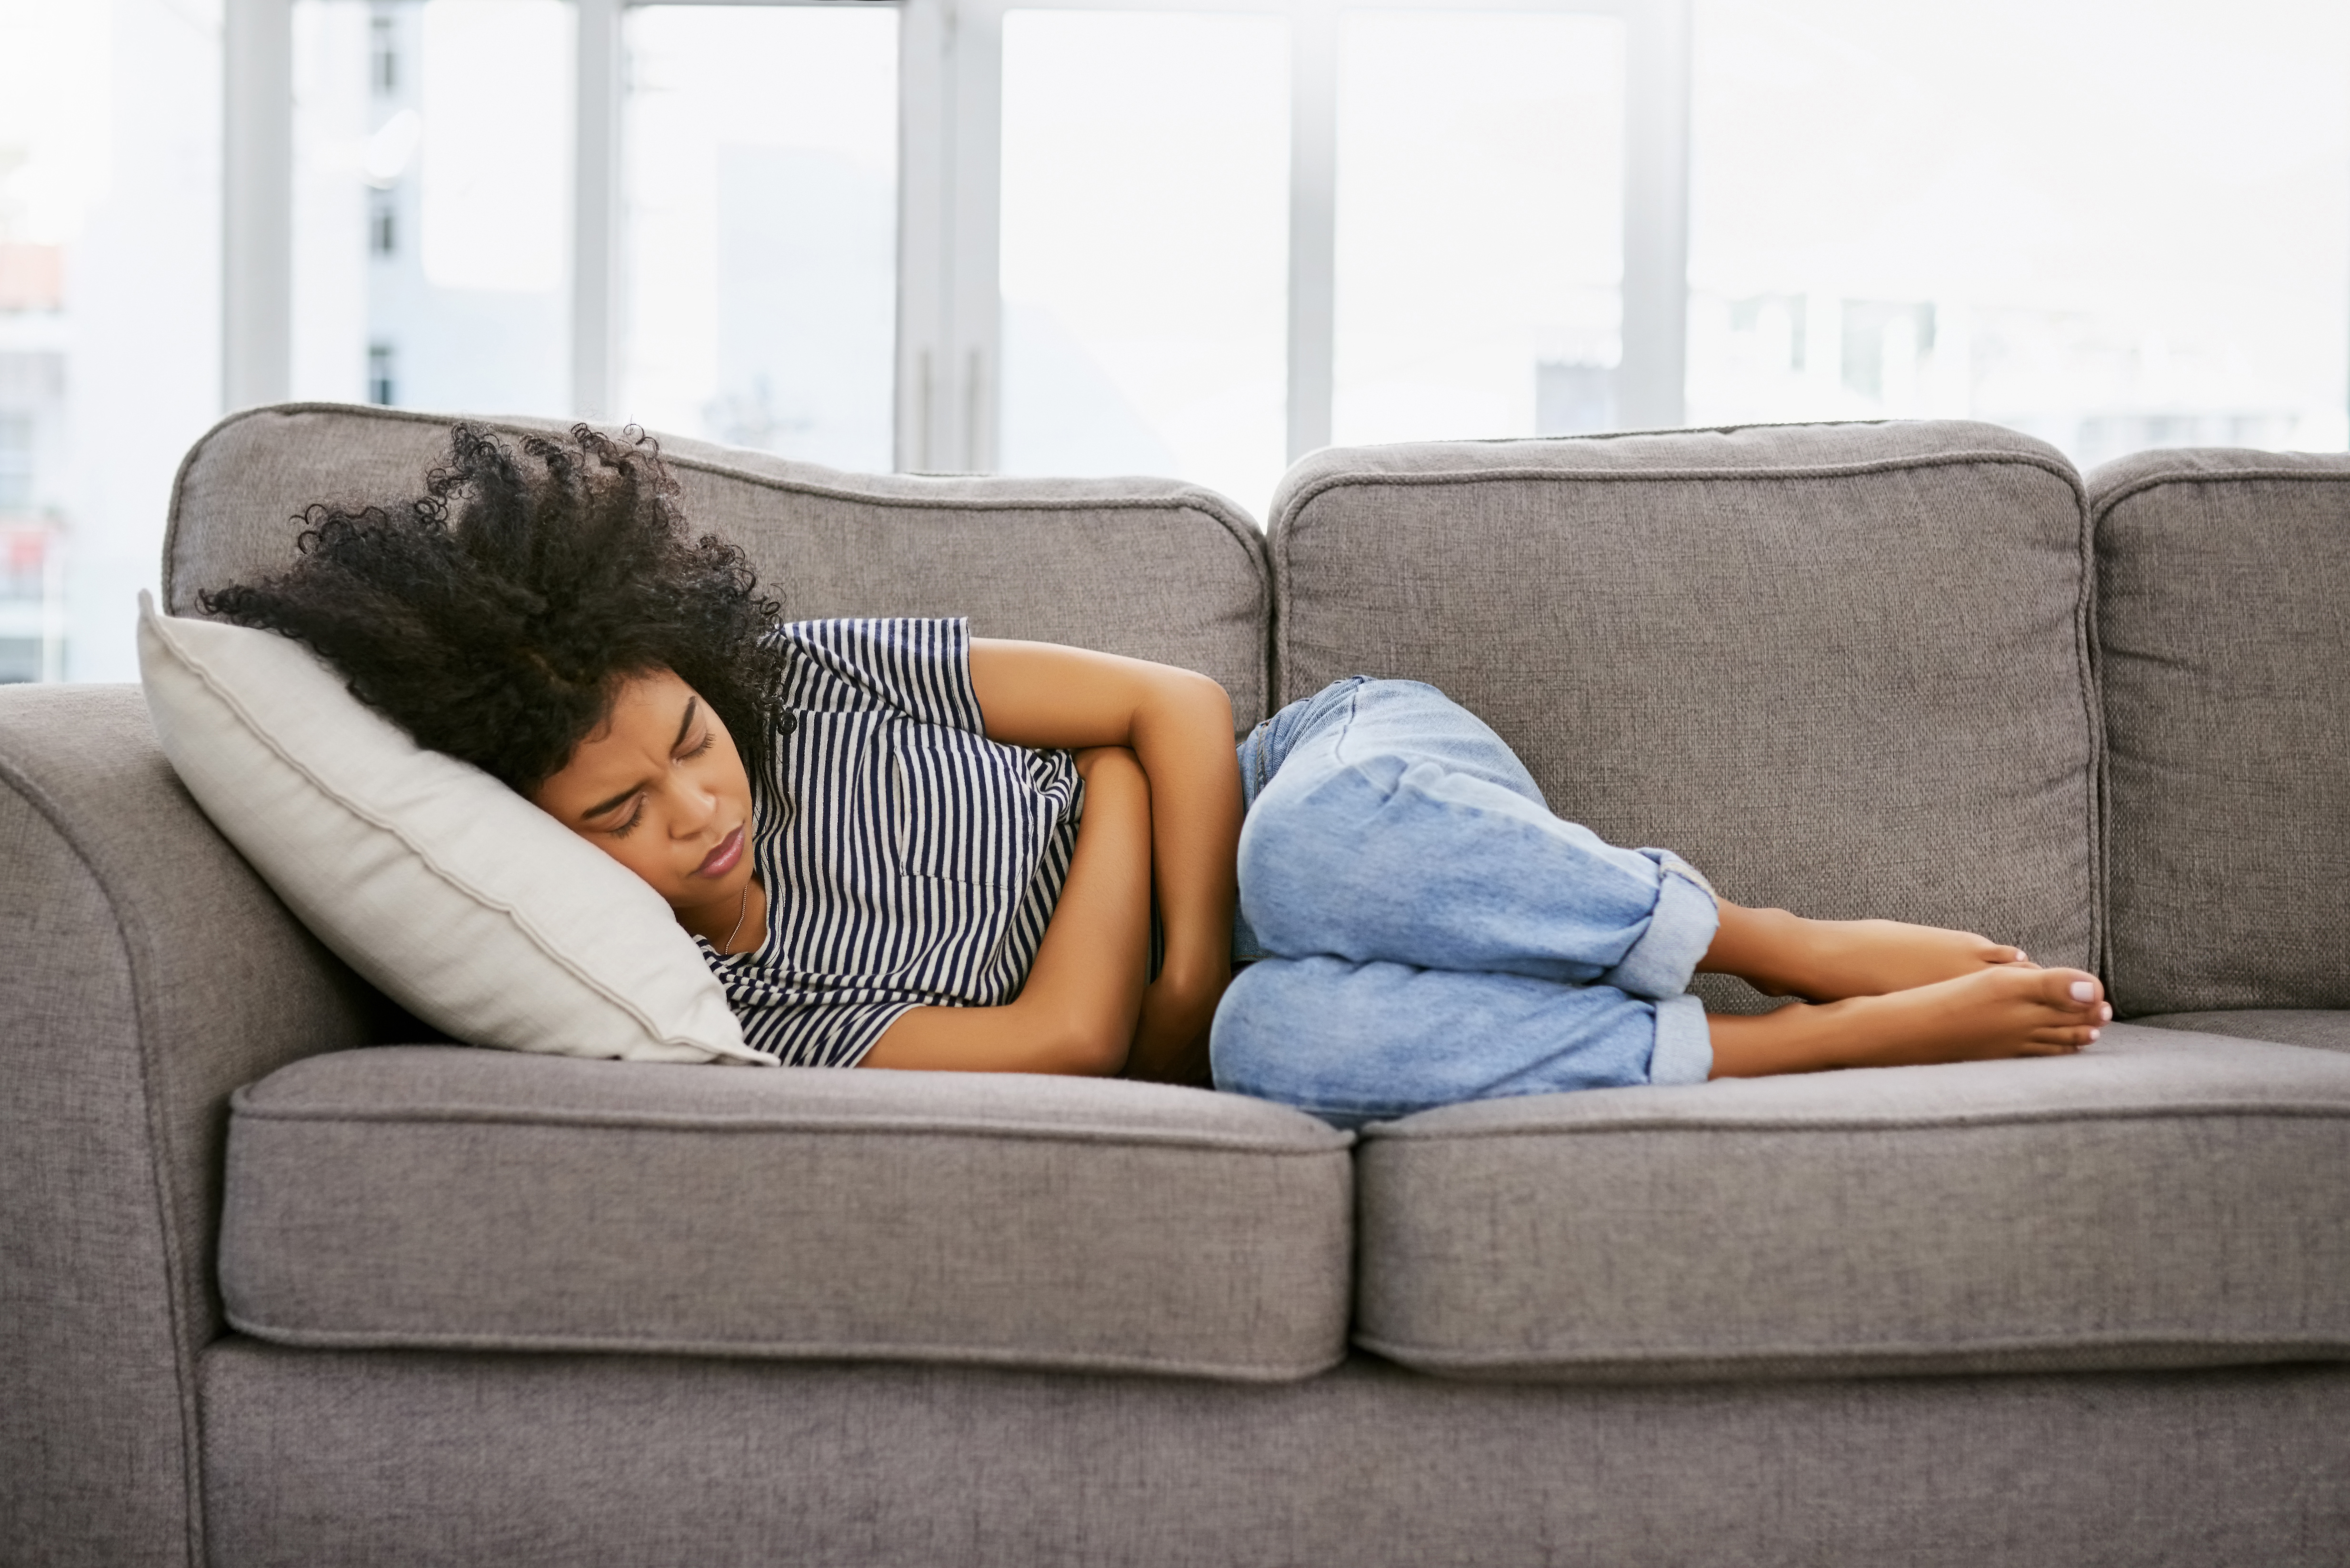 cramps Menstrual pain